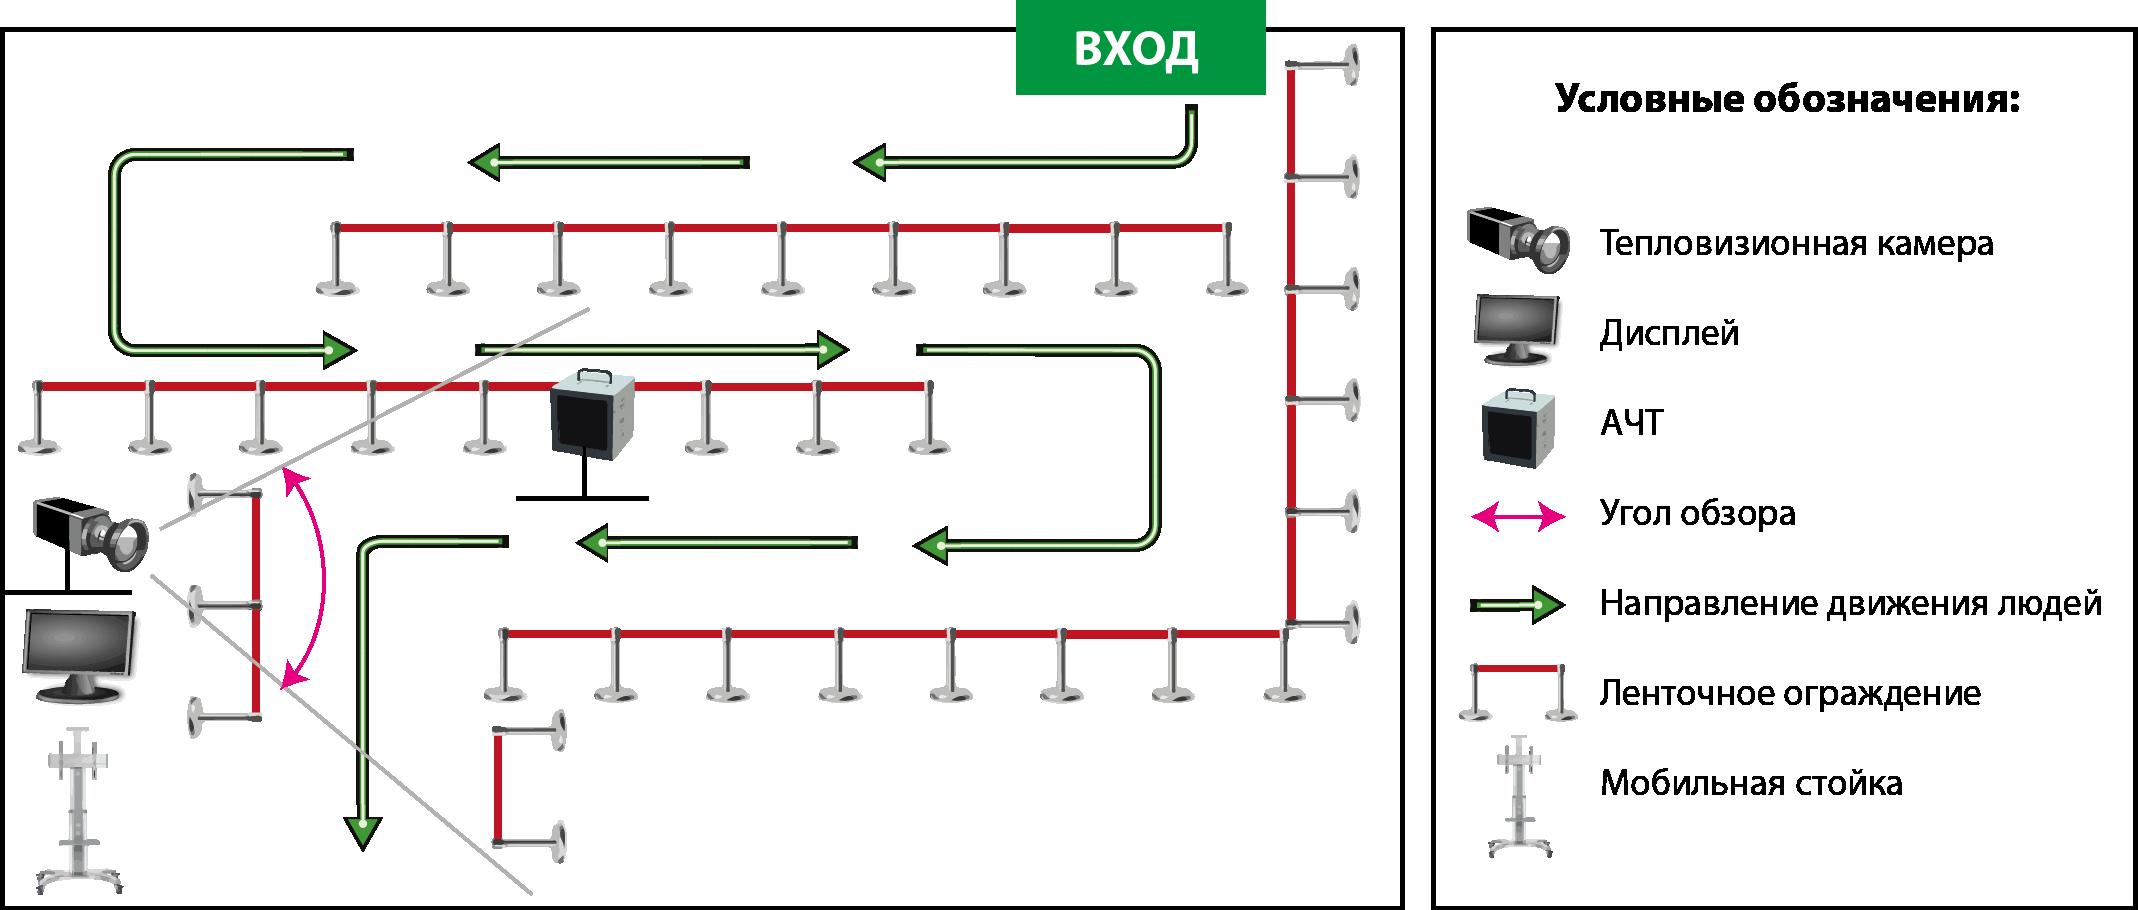 Схема устройства автоматизированного тепловизионного комплекса